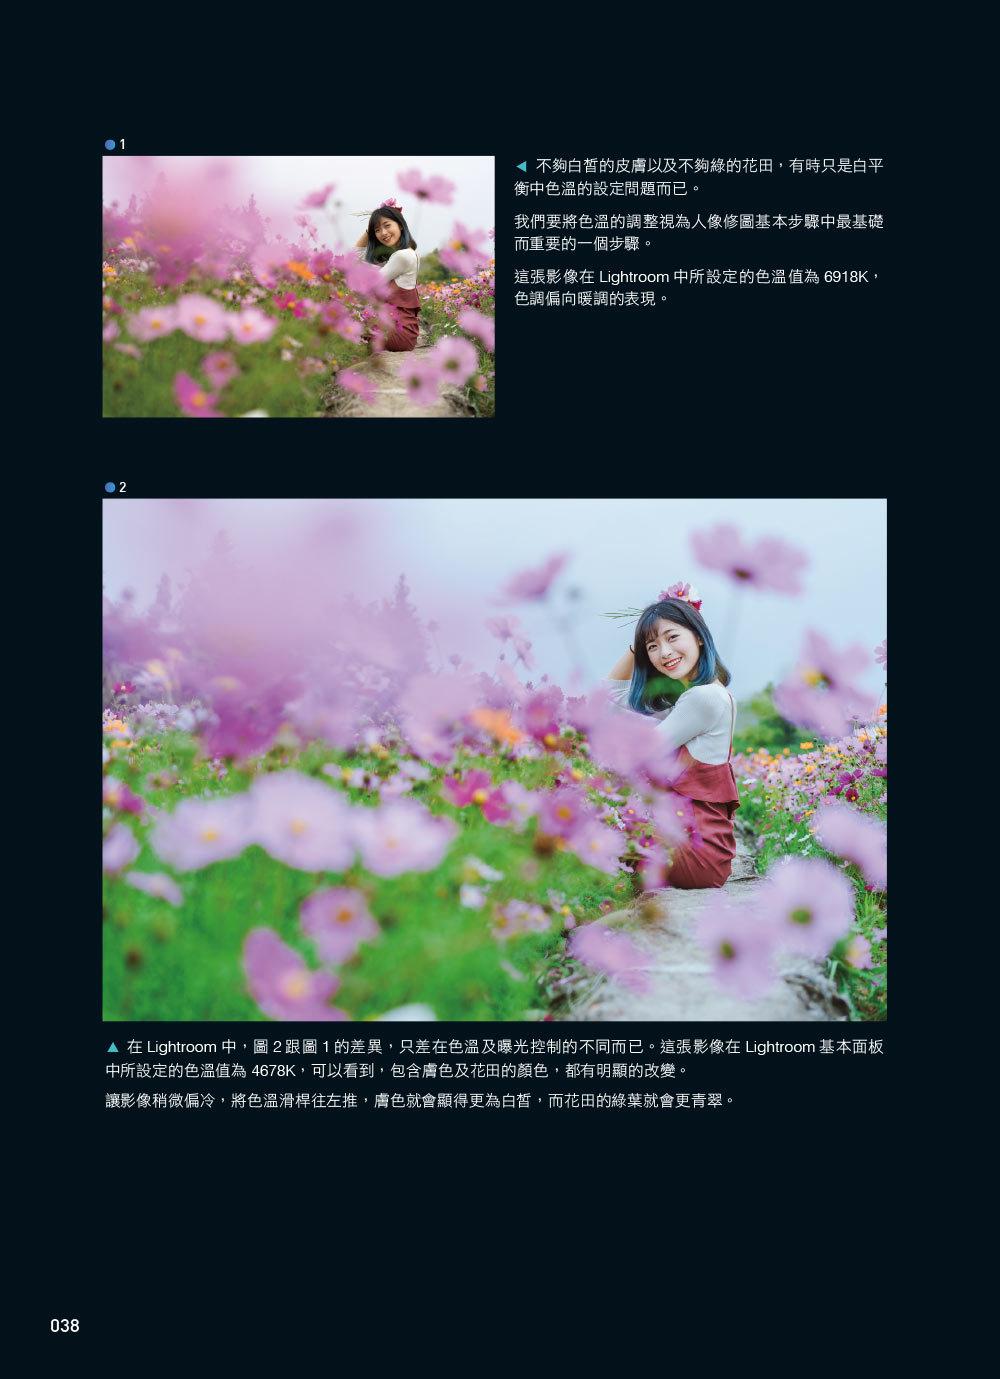 Lightroom Classic 魅力人像修圖經典版|調光調色x美膚秘訣x日系風x韓式婚紗-preview-3